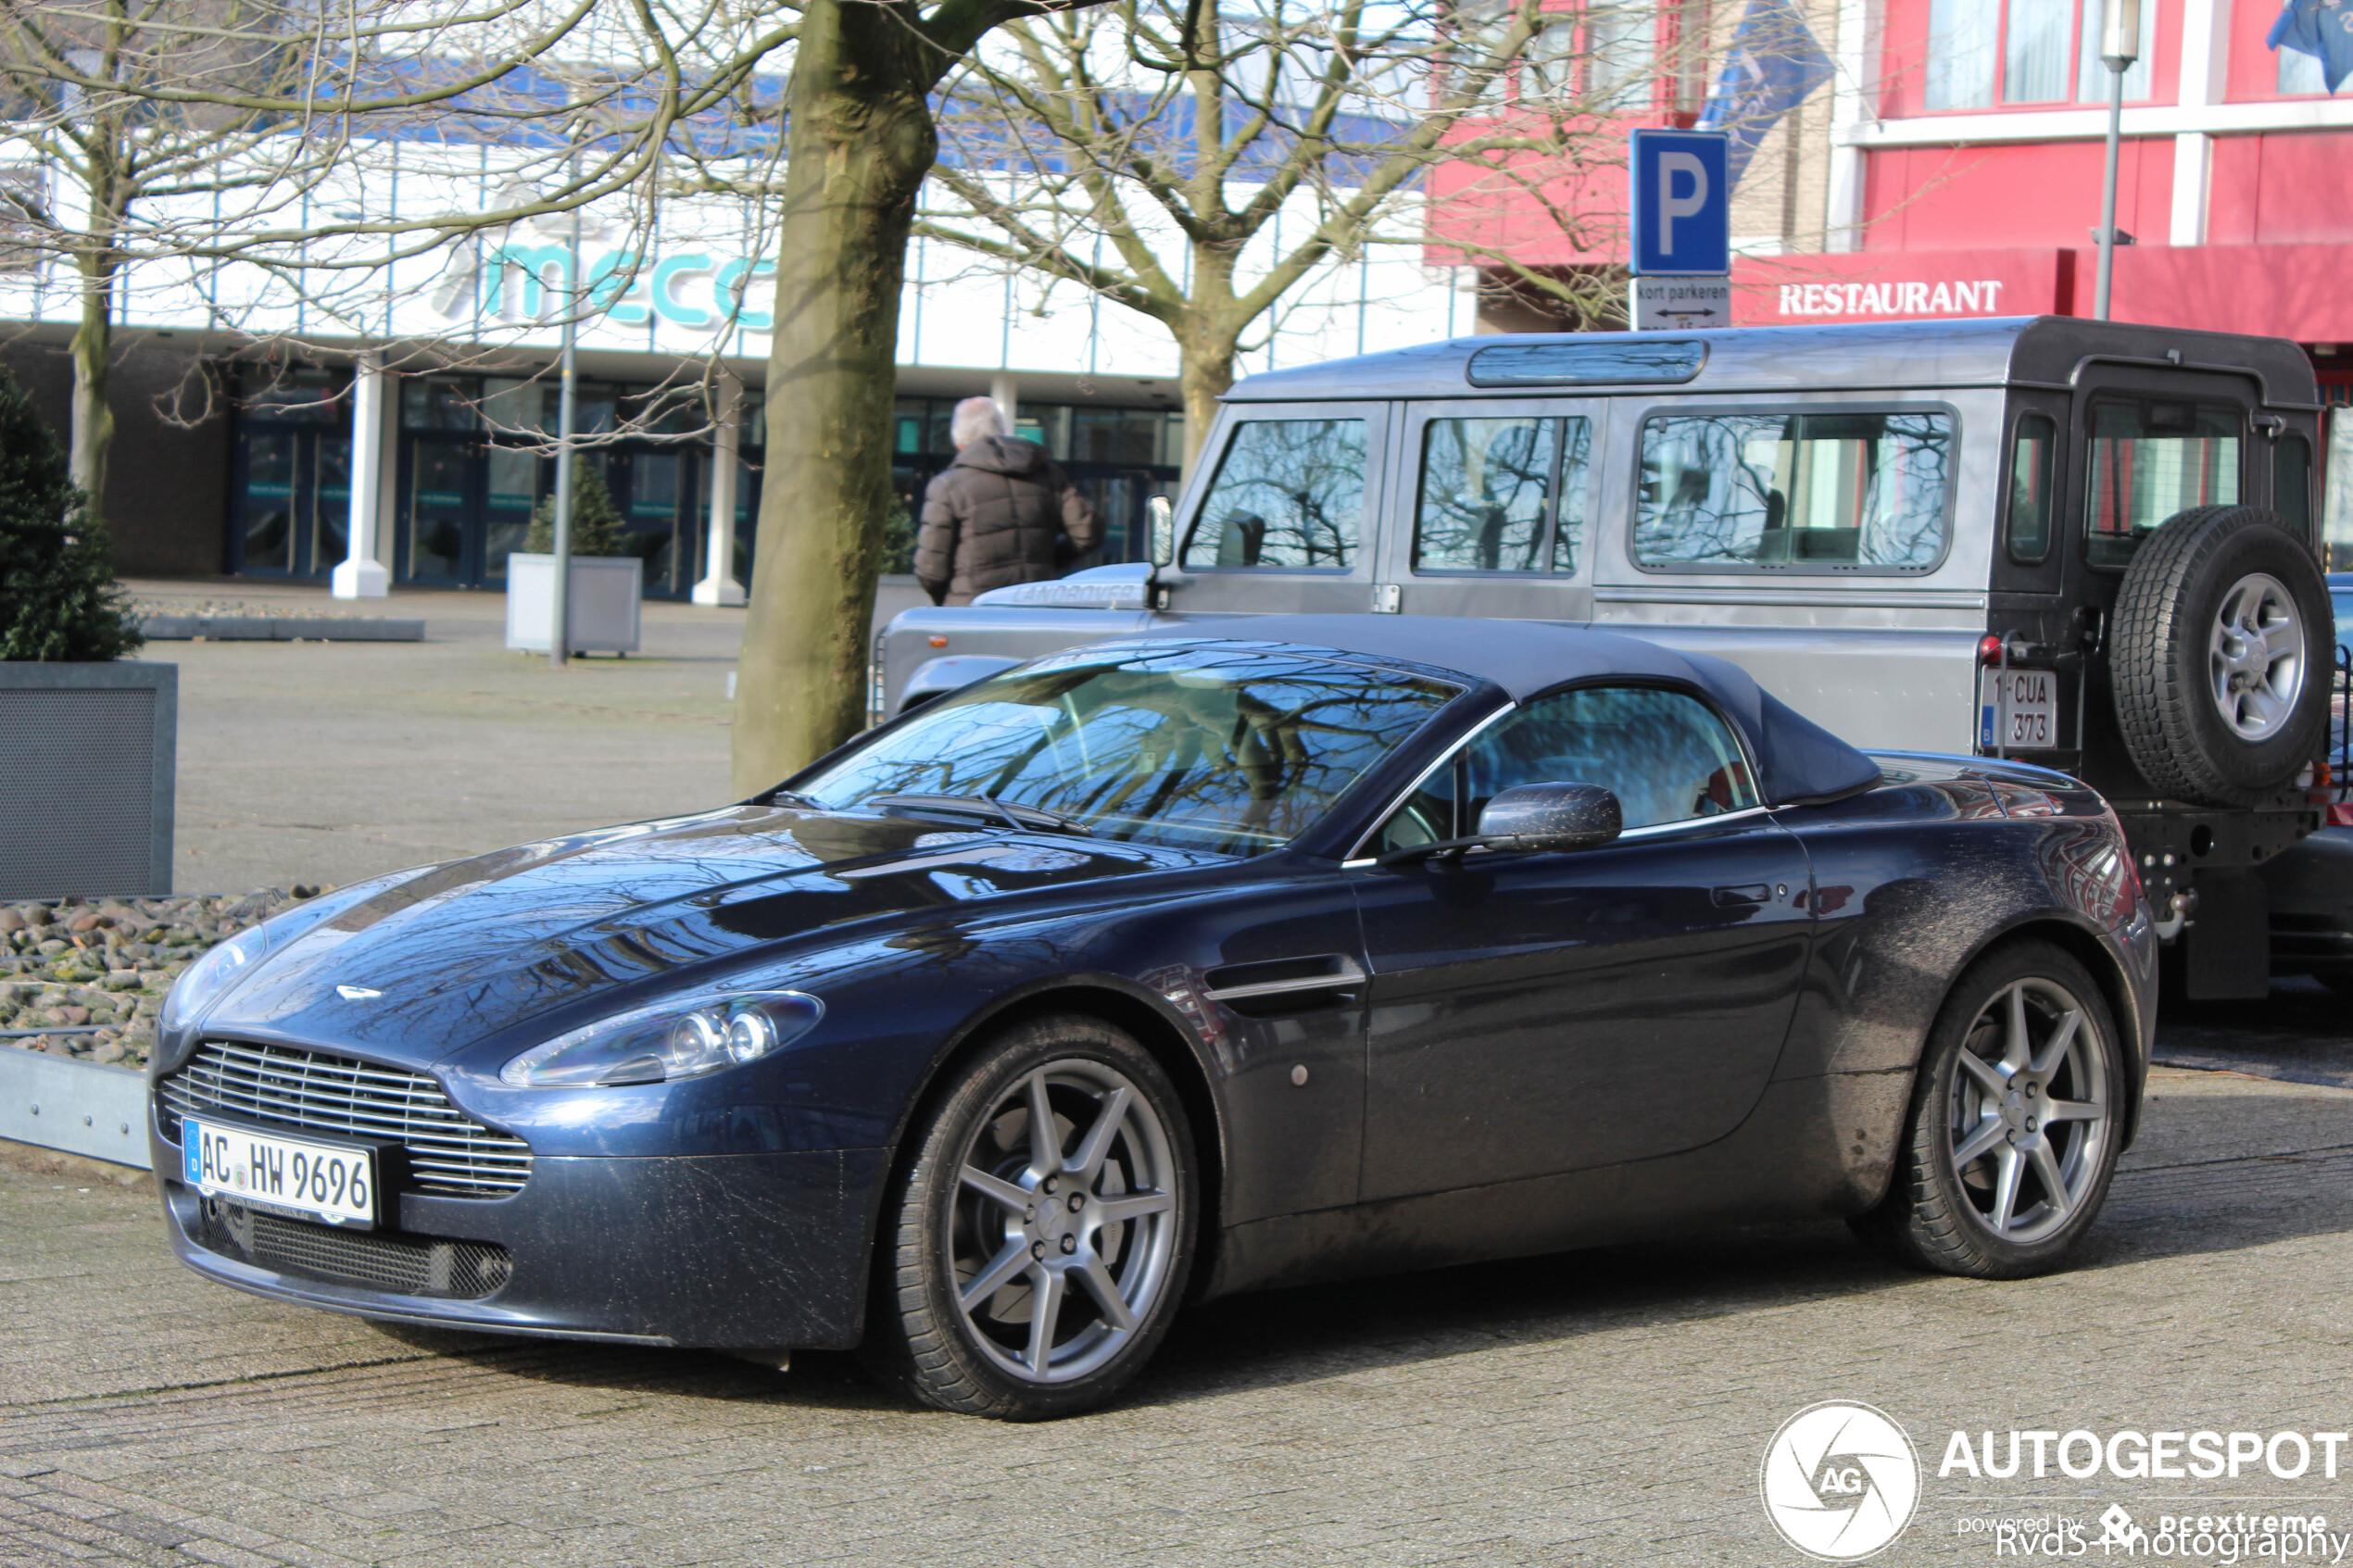 Aston Martin V8 Vantage Roadster 30 March 2020 Autogespot